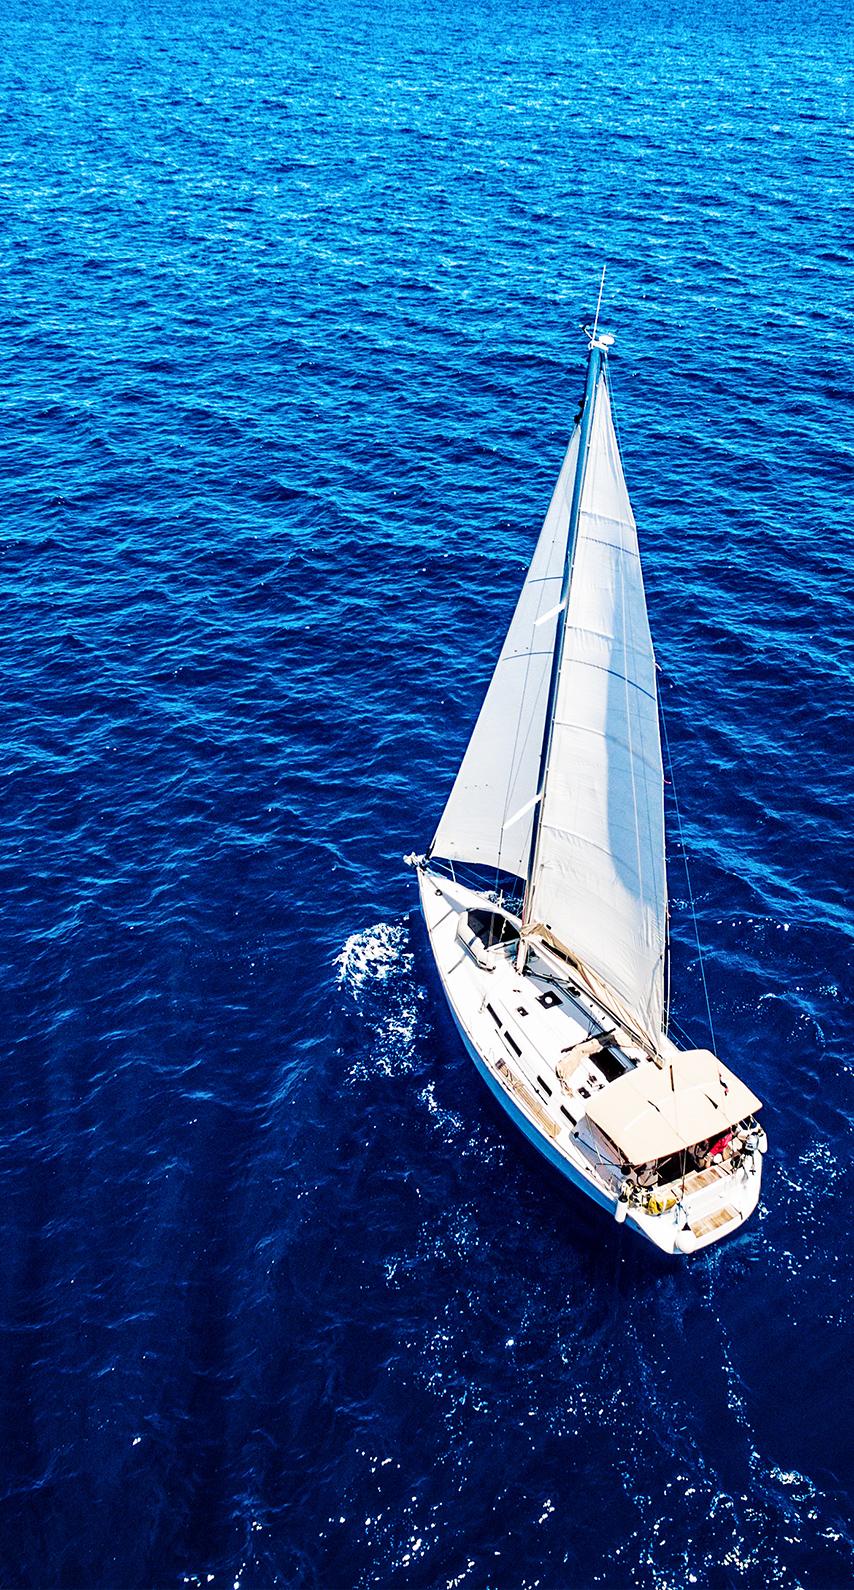 yachting, ship